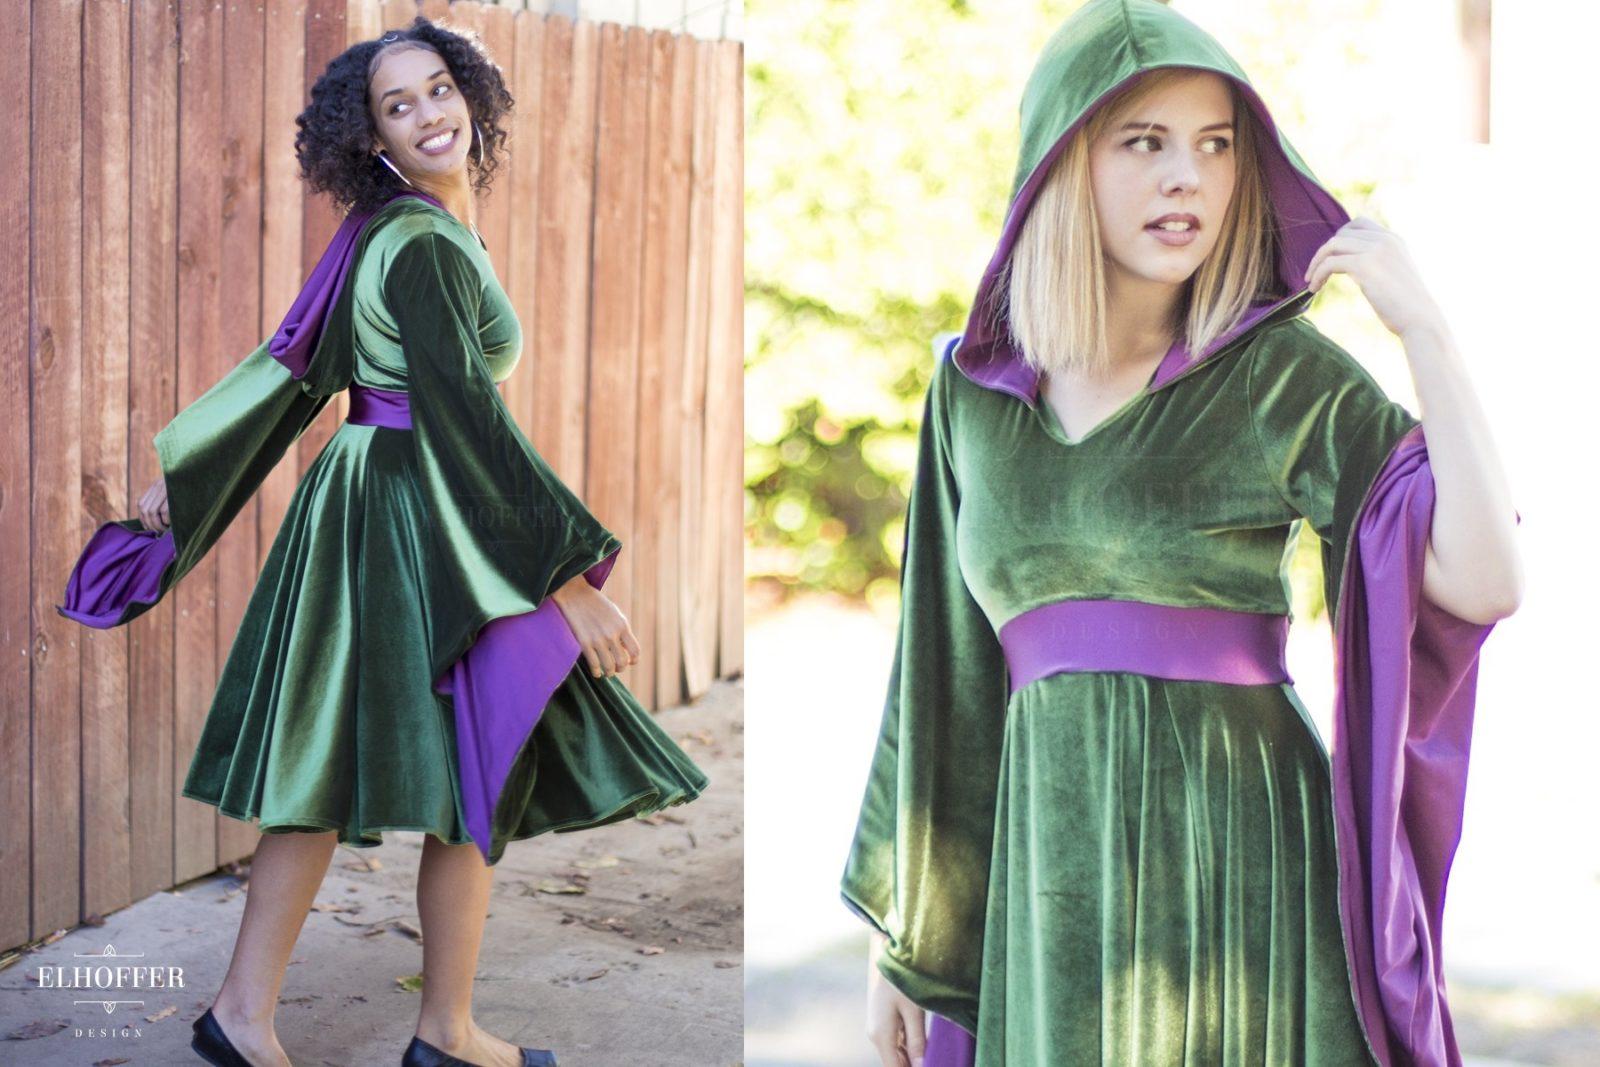 New Padme' Amidala Dress by Elhoffer Design